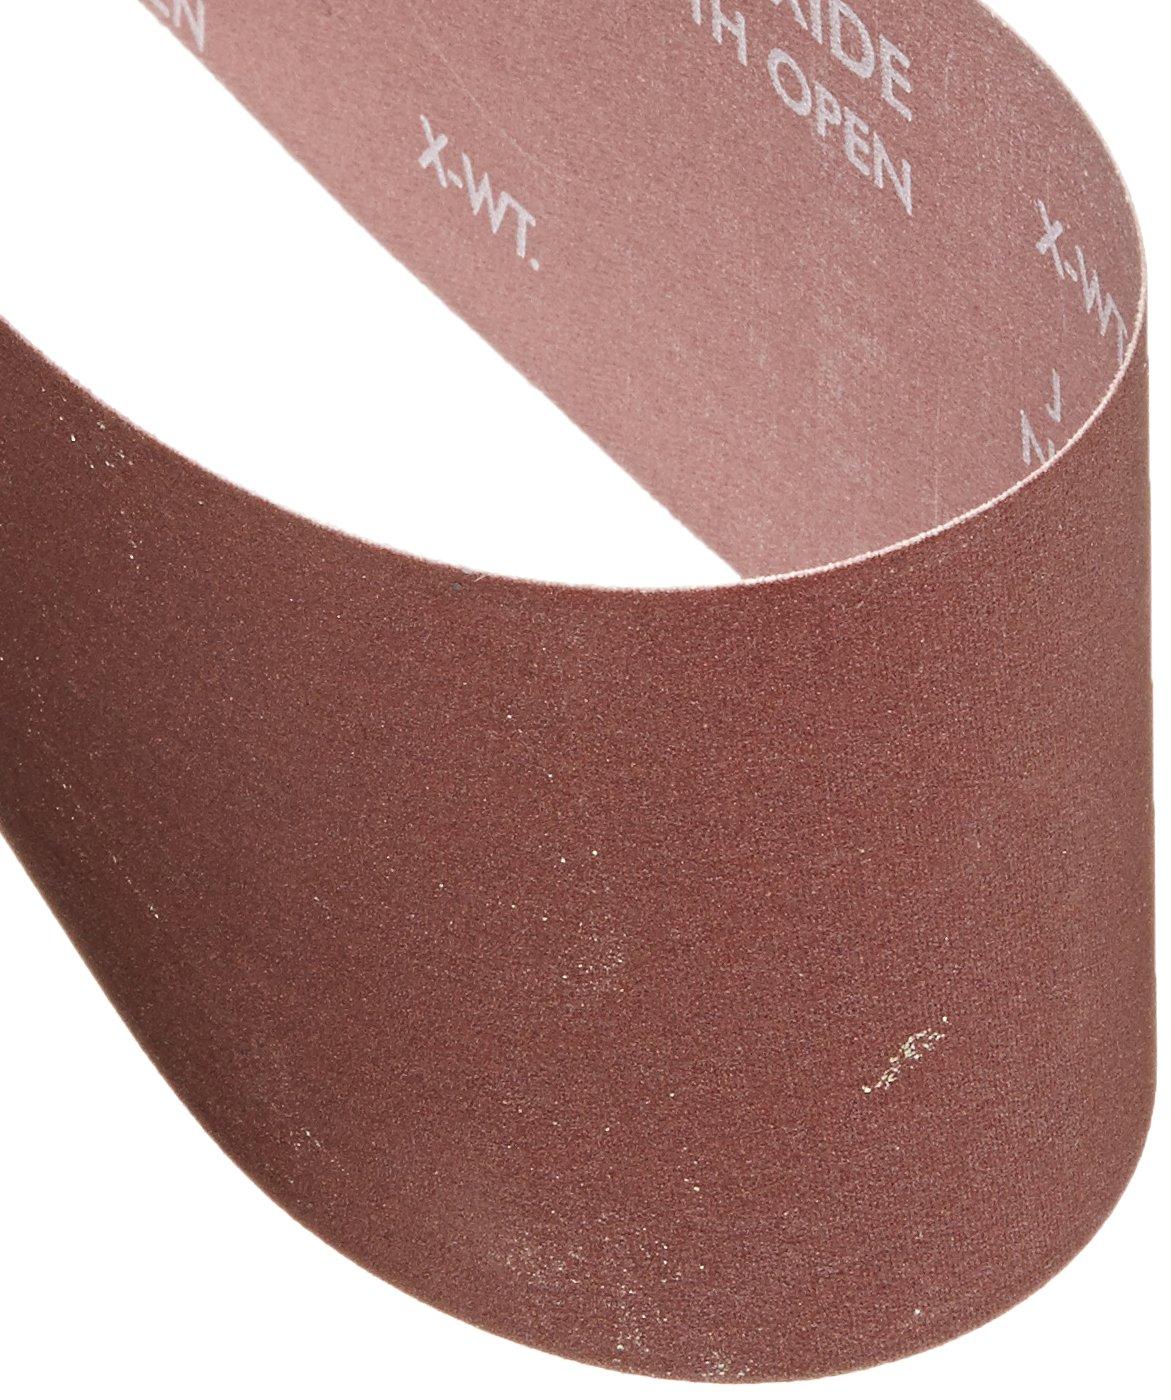 Norton 07660705285 Portable Abrasive Belt, Cotton Fiber Backing, Aluminum Oxide, 24'' Length x 4'' Width, Grit 180 Extra Fine (Pack of 5)